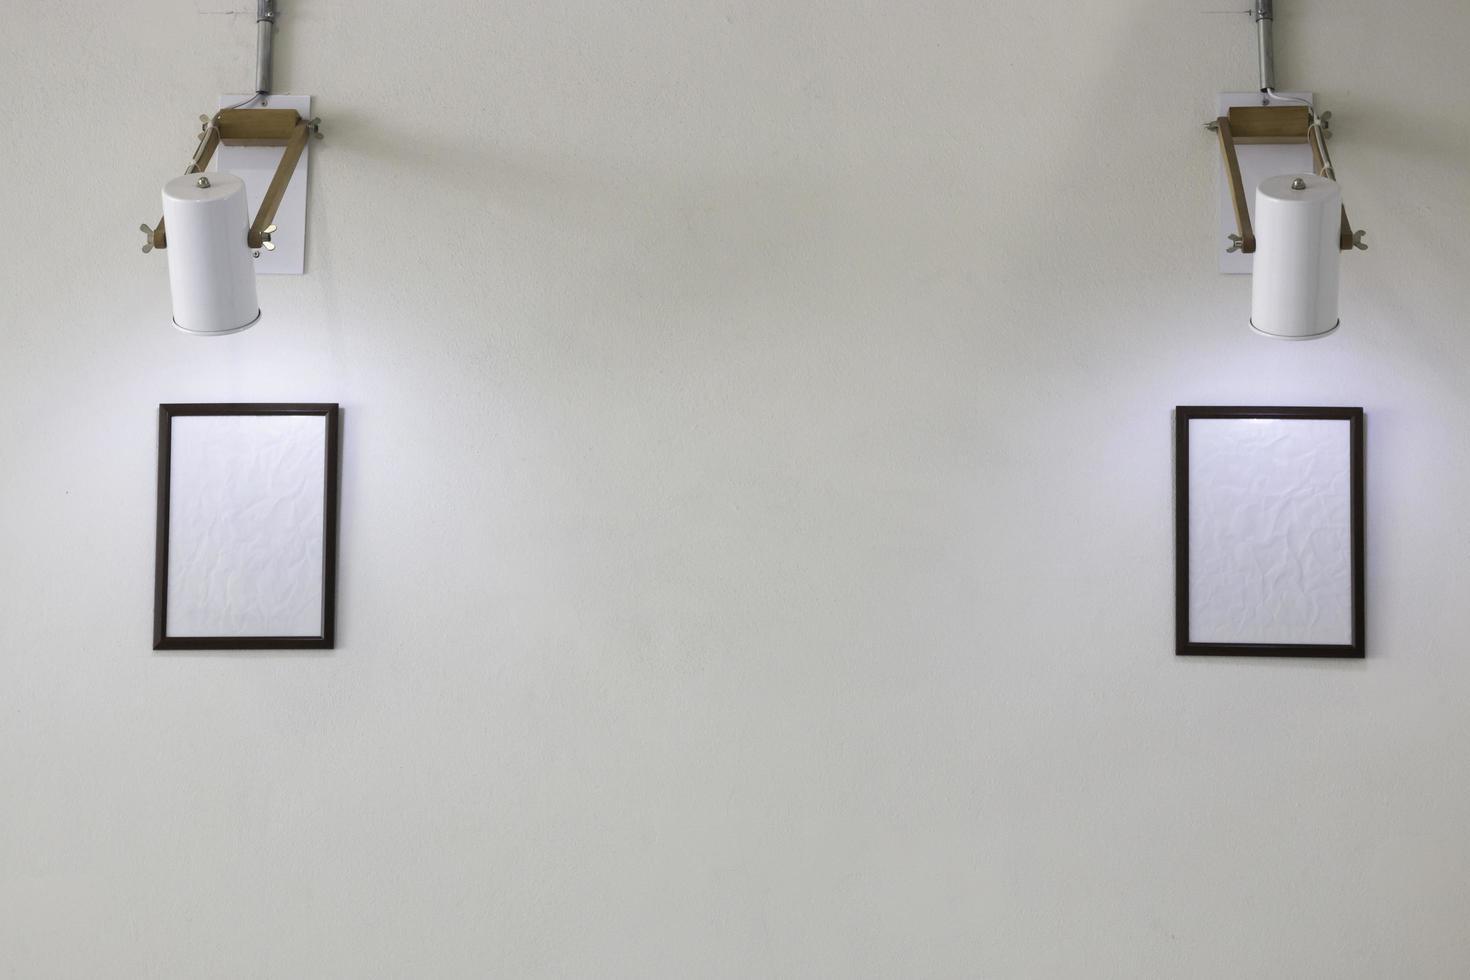 zwei leere Bilderrahmen an weißer Wand foto